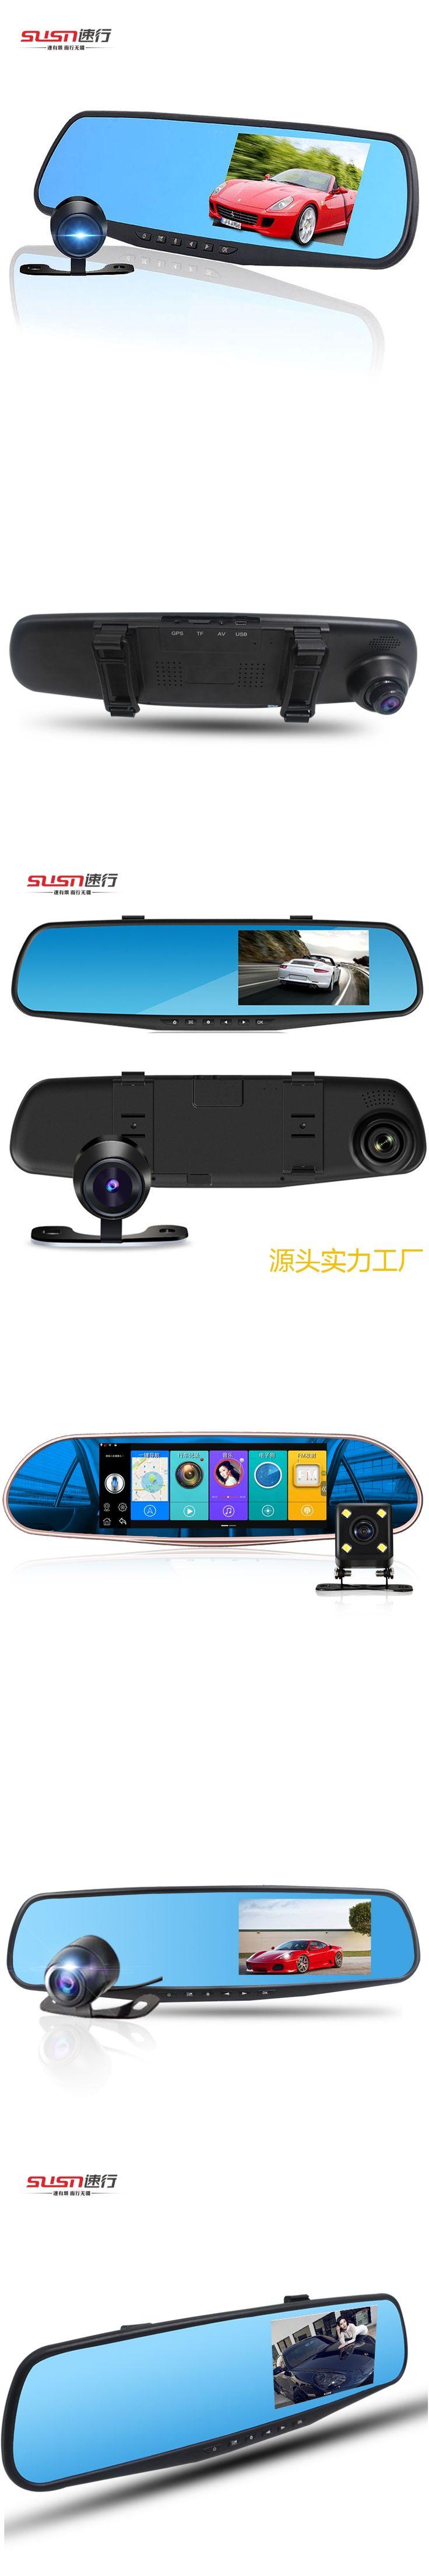 5 Inch TouchTFT LCD Car DVR Camera Mirror Dual Lens Full HD 1080p Loop Recording Anti-shake Video Recorder Dash Cam G-sensor